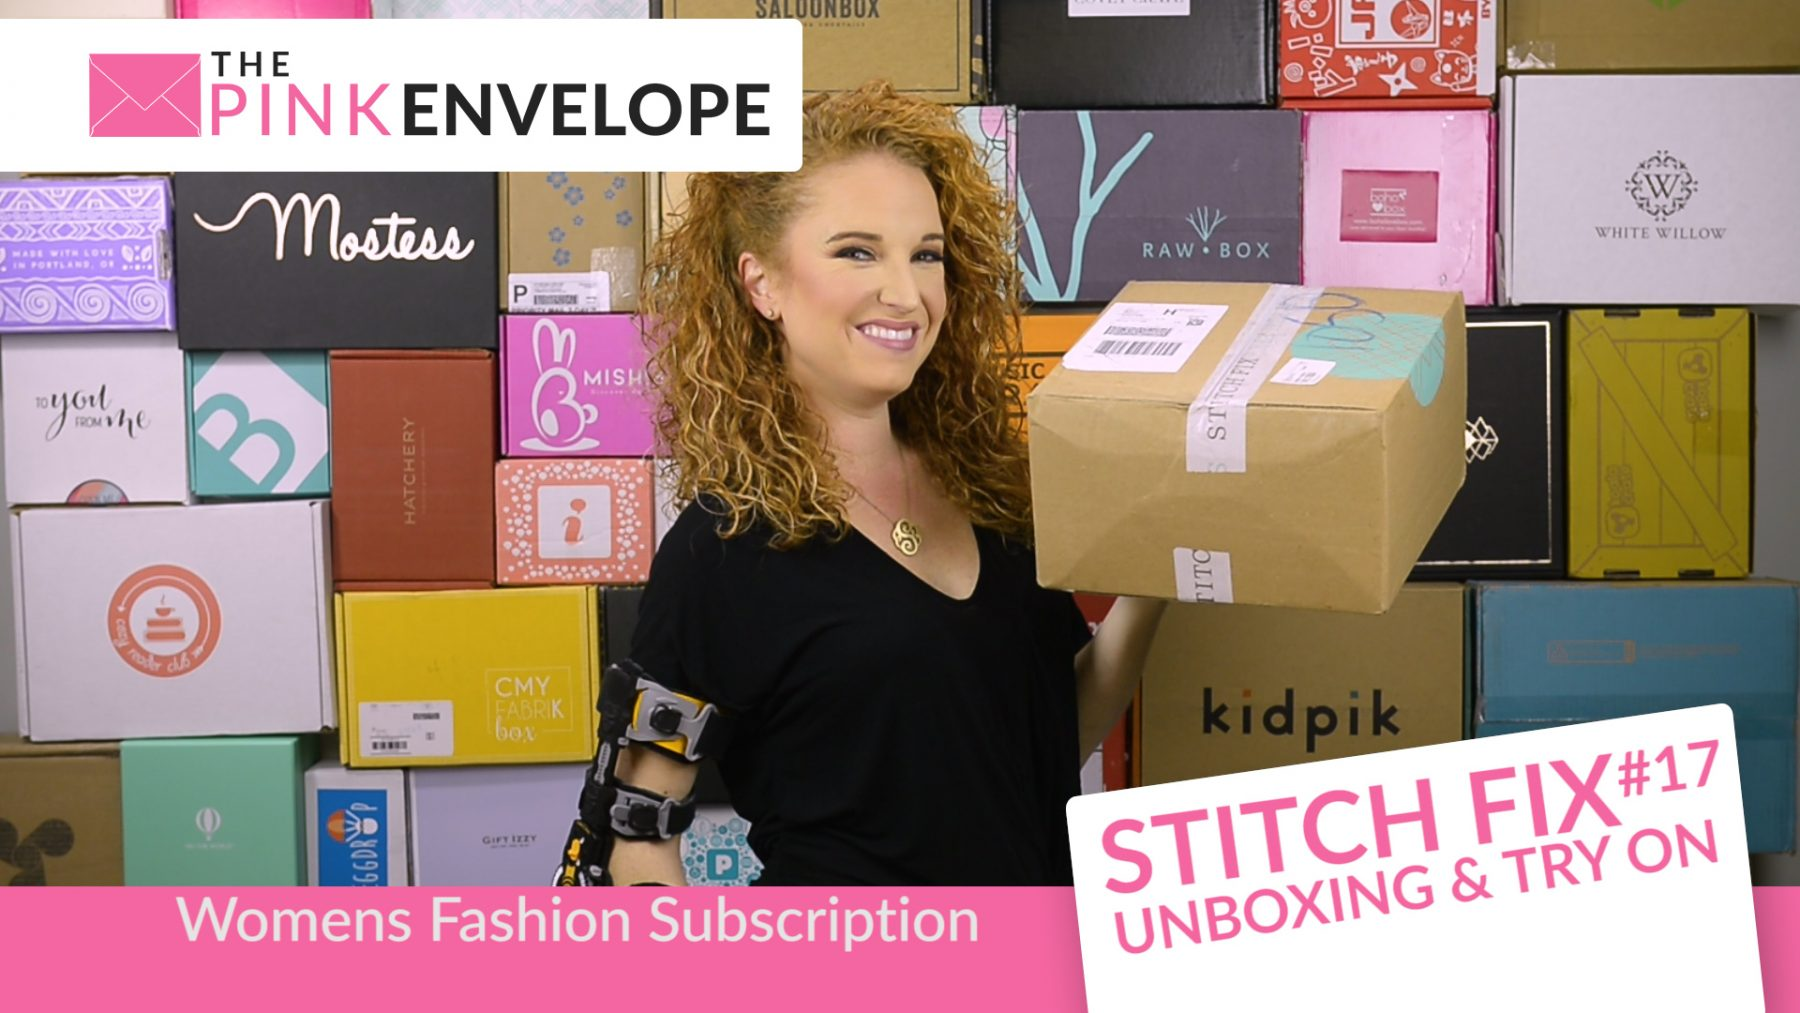 Stitch Fix Unboxing #17 – Womens Fashion Subscription